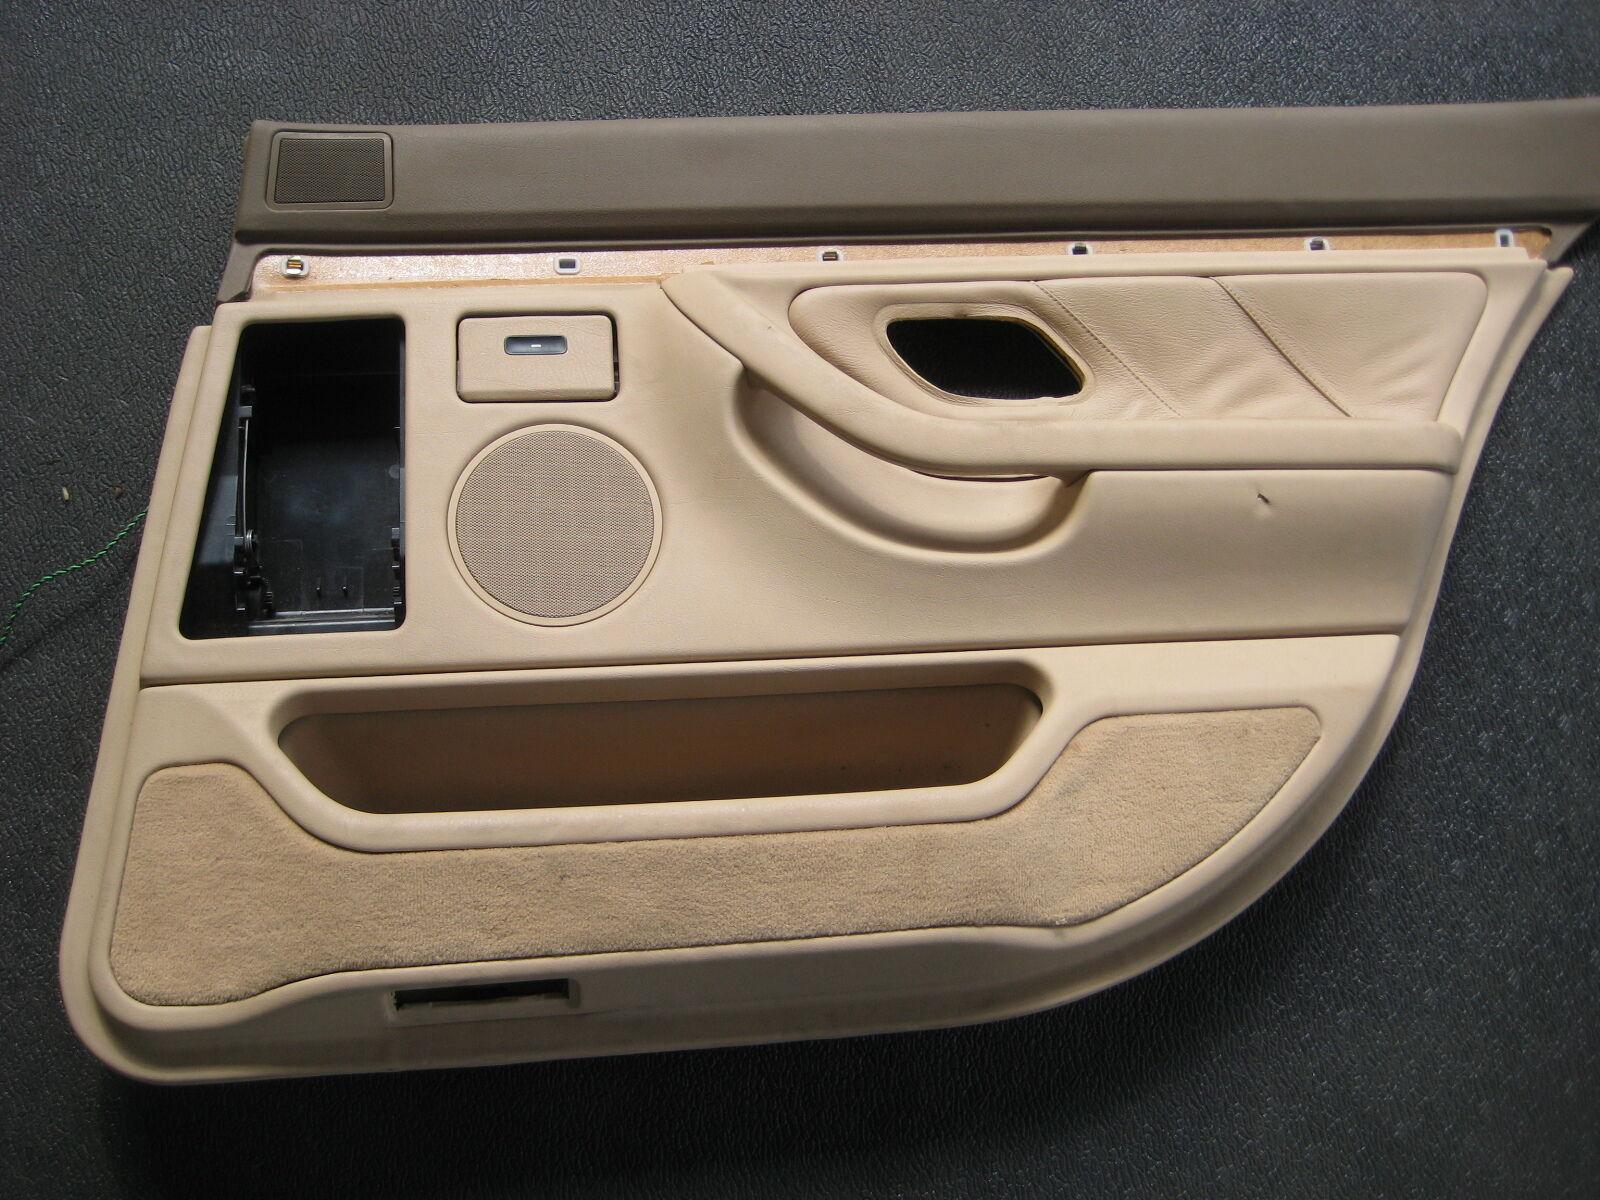 174 bmw 740i 740il 750il 1995 front premium interior door handle - Bmw E1938 Beige Passenger Right Side Rear Door Panel 1995 2001 740i 740il